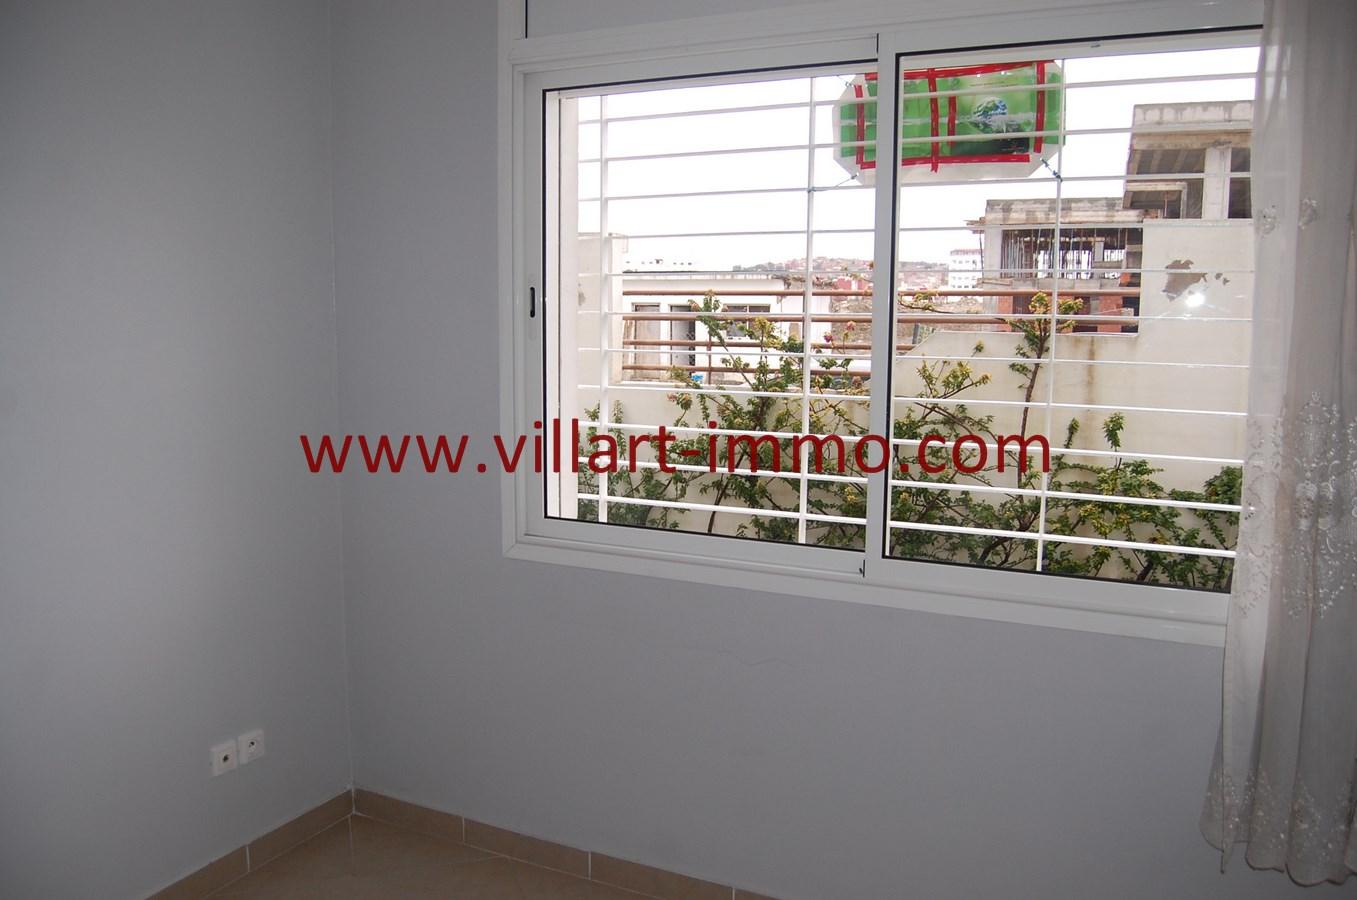 2-Vente-Appartement-Tanger-Route-de-Rabat-Chambre 1-VA474-Villart Immo